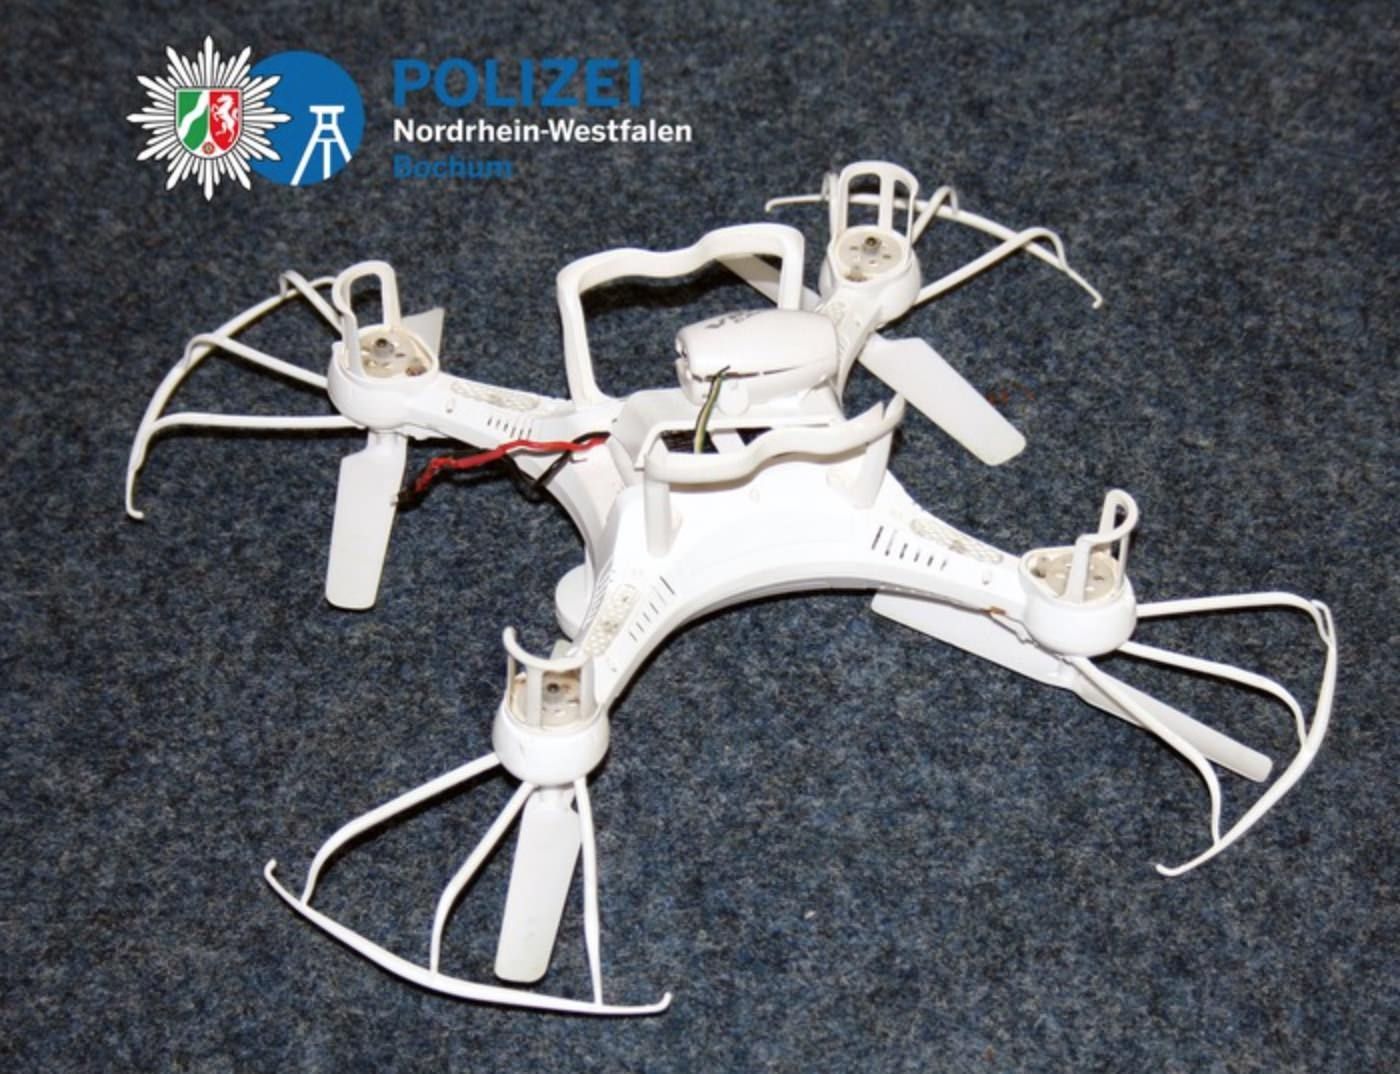 Unfall - Quadrocopter knallt in fahrendes Auto -